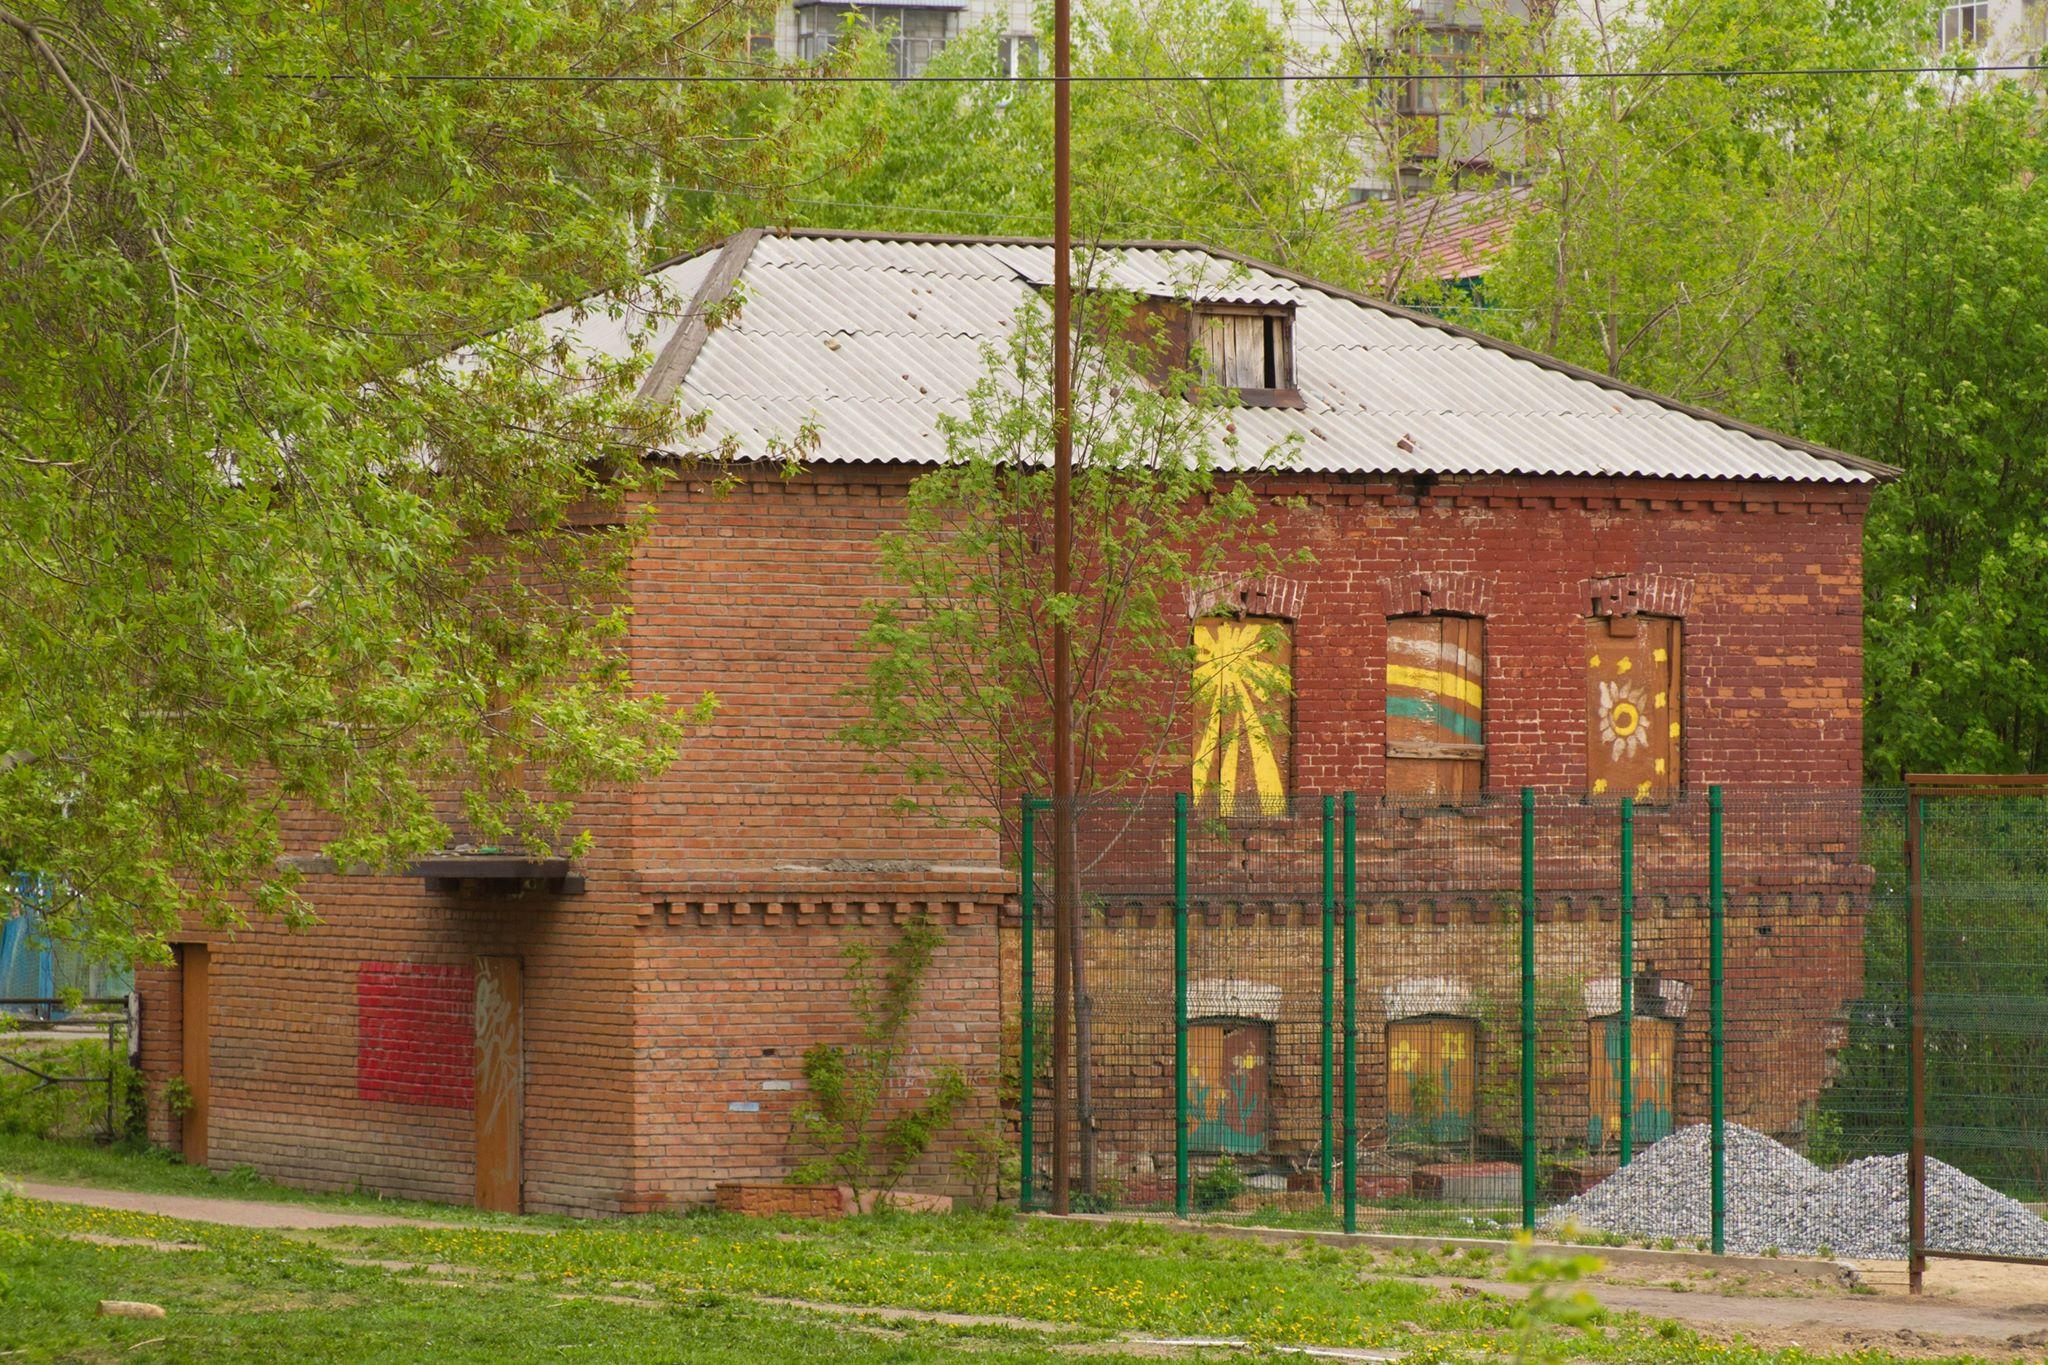 По словам краеведа Константина Голодяева, здание построили после пожара в 1909 году